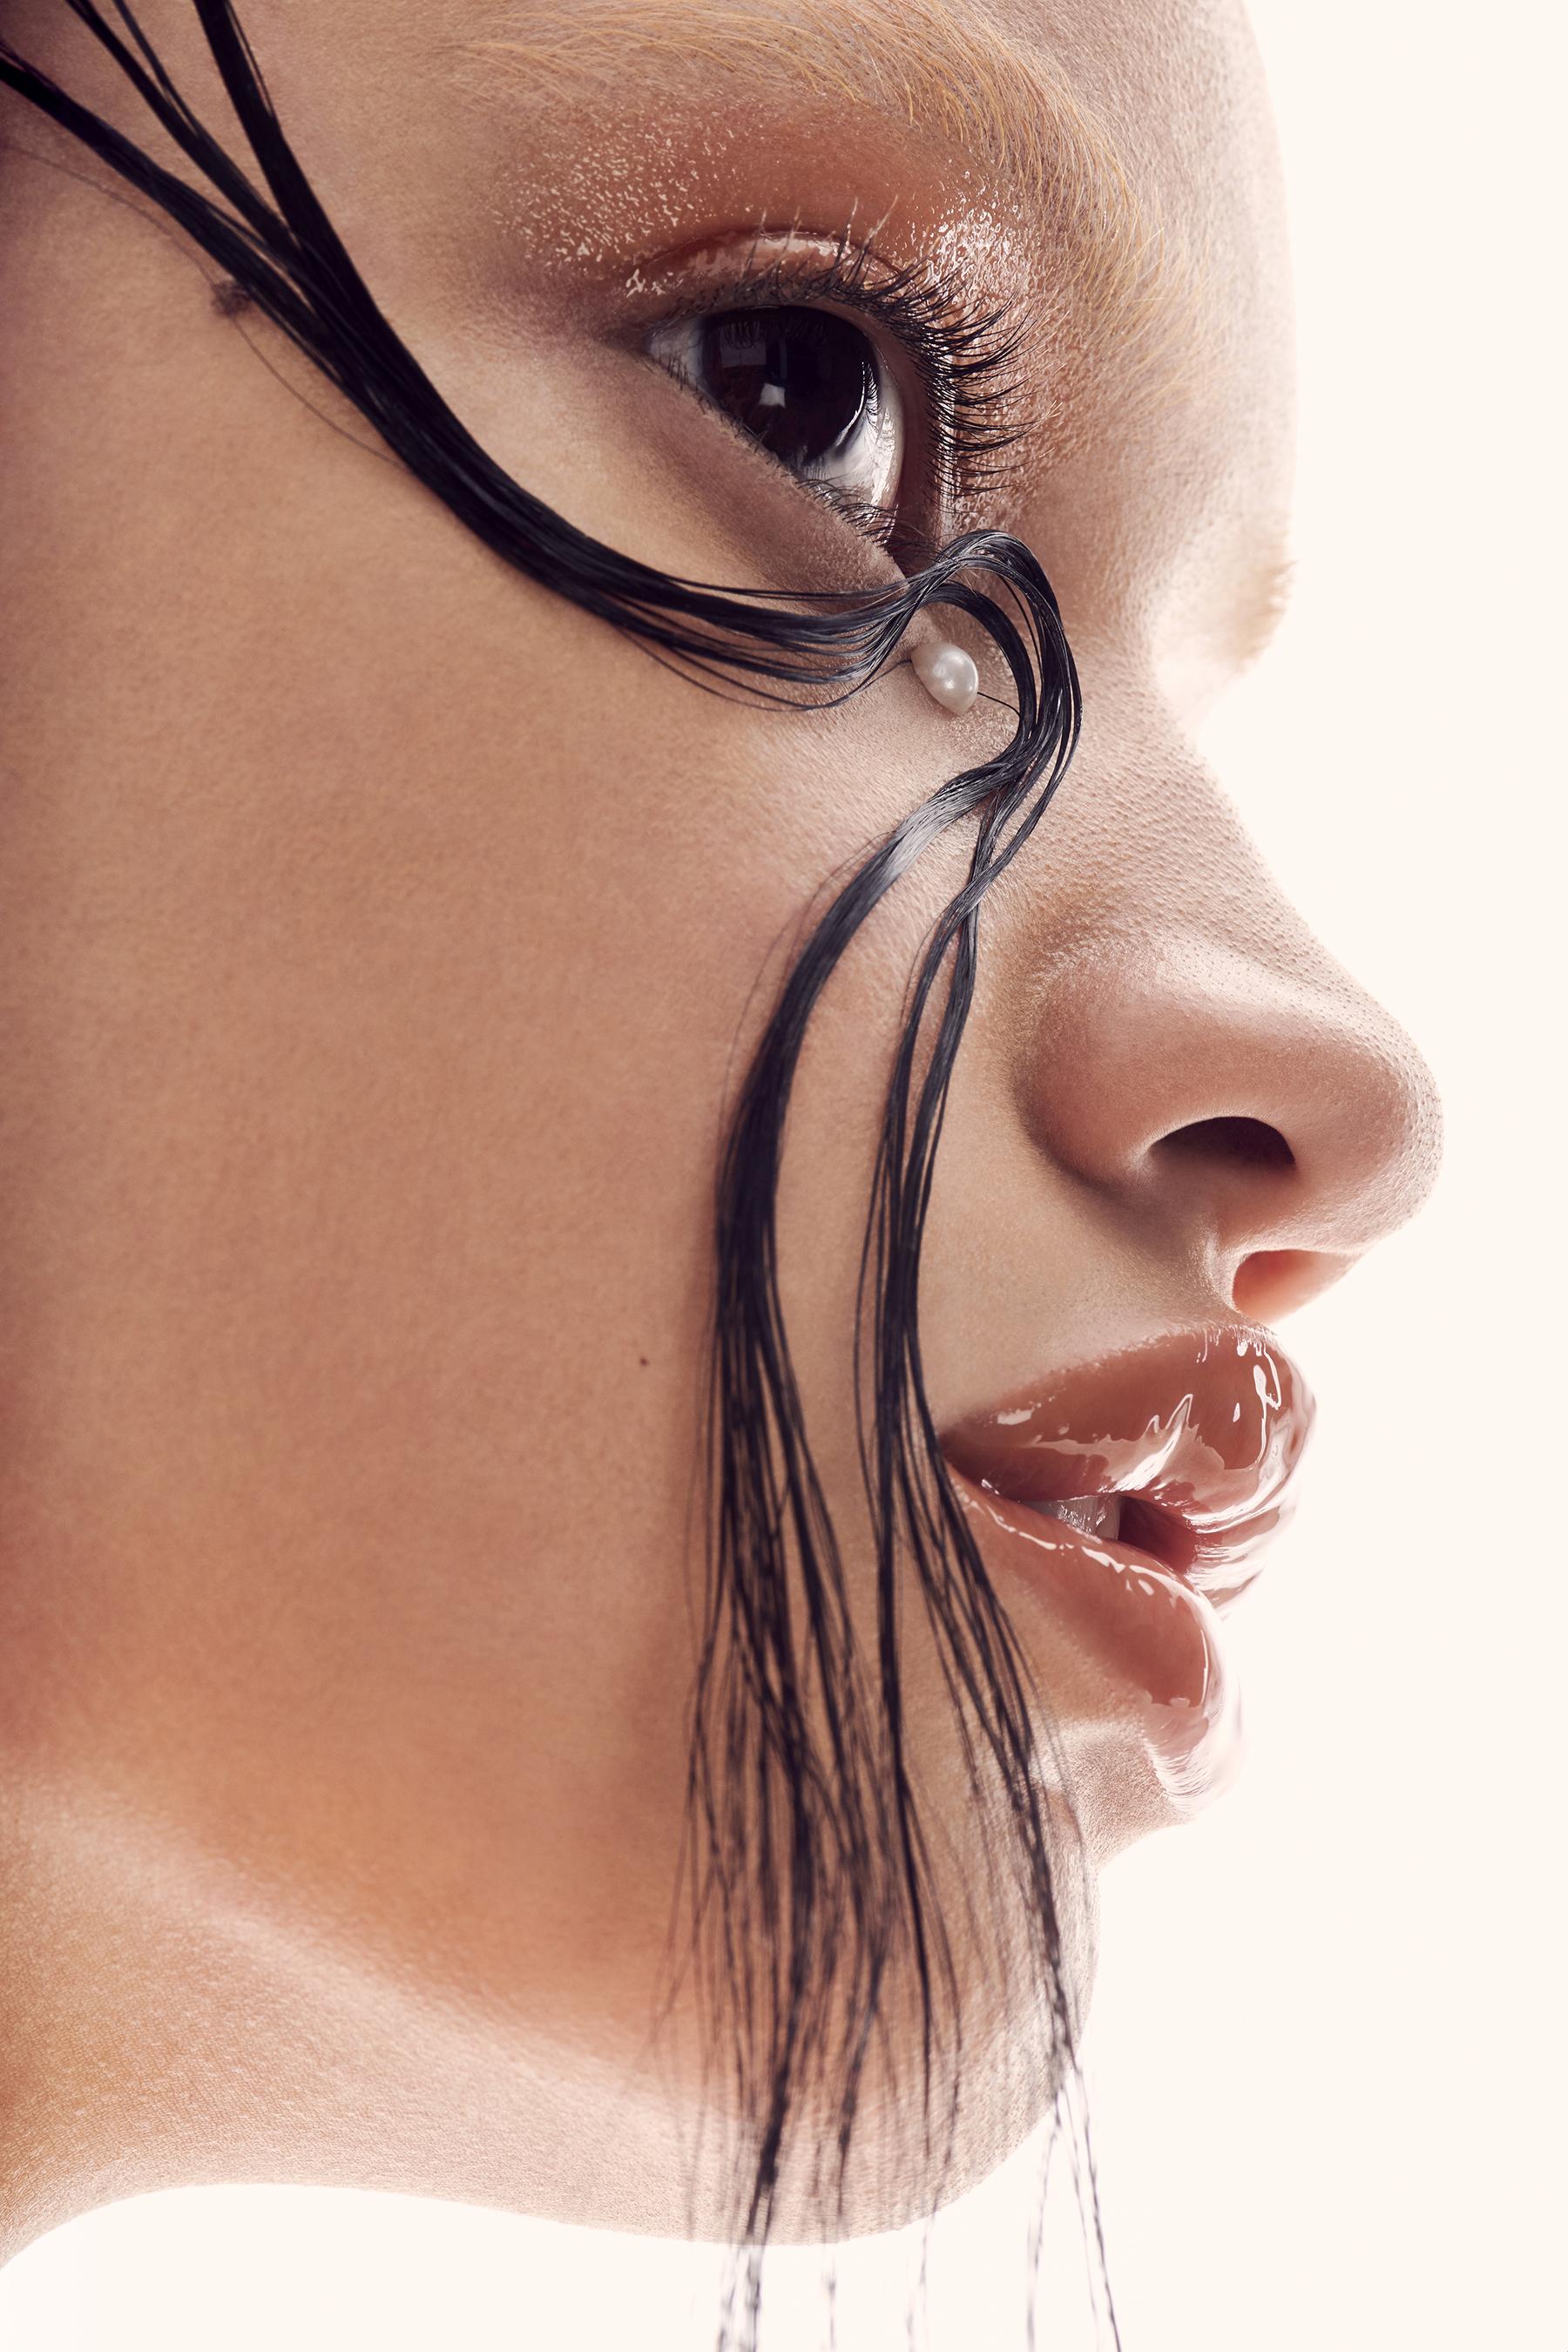 Model: Avril Marion  Make Up Artist: Caitlin Wooters  Hair Stylist: Nasty Miliaeva  Stylist: Jenn Park Krulik